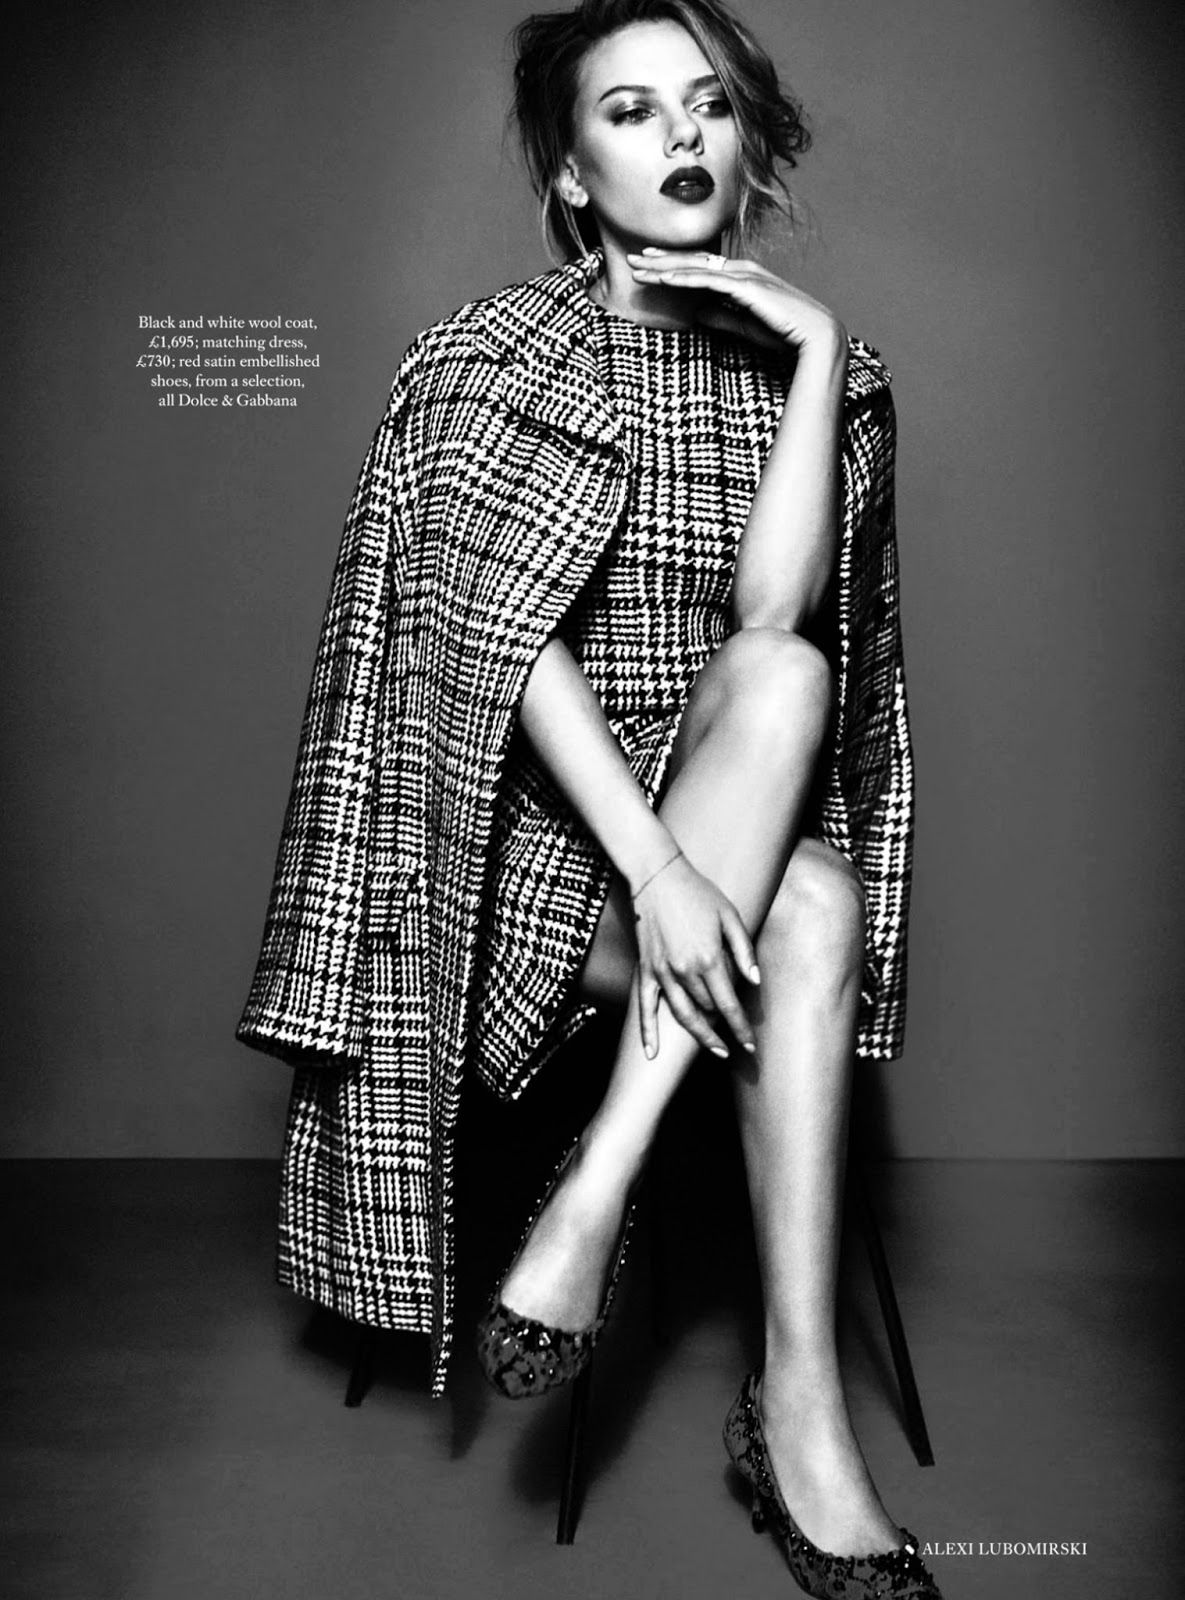 Scarlett Johansson for Harper's Bazaar UK October 2013. #editorial #fashion #photography